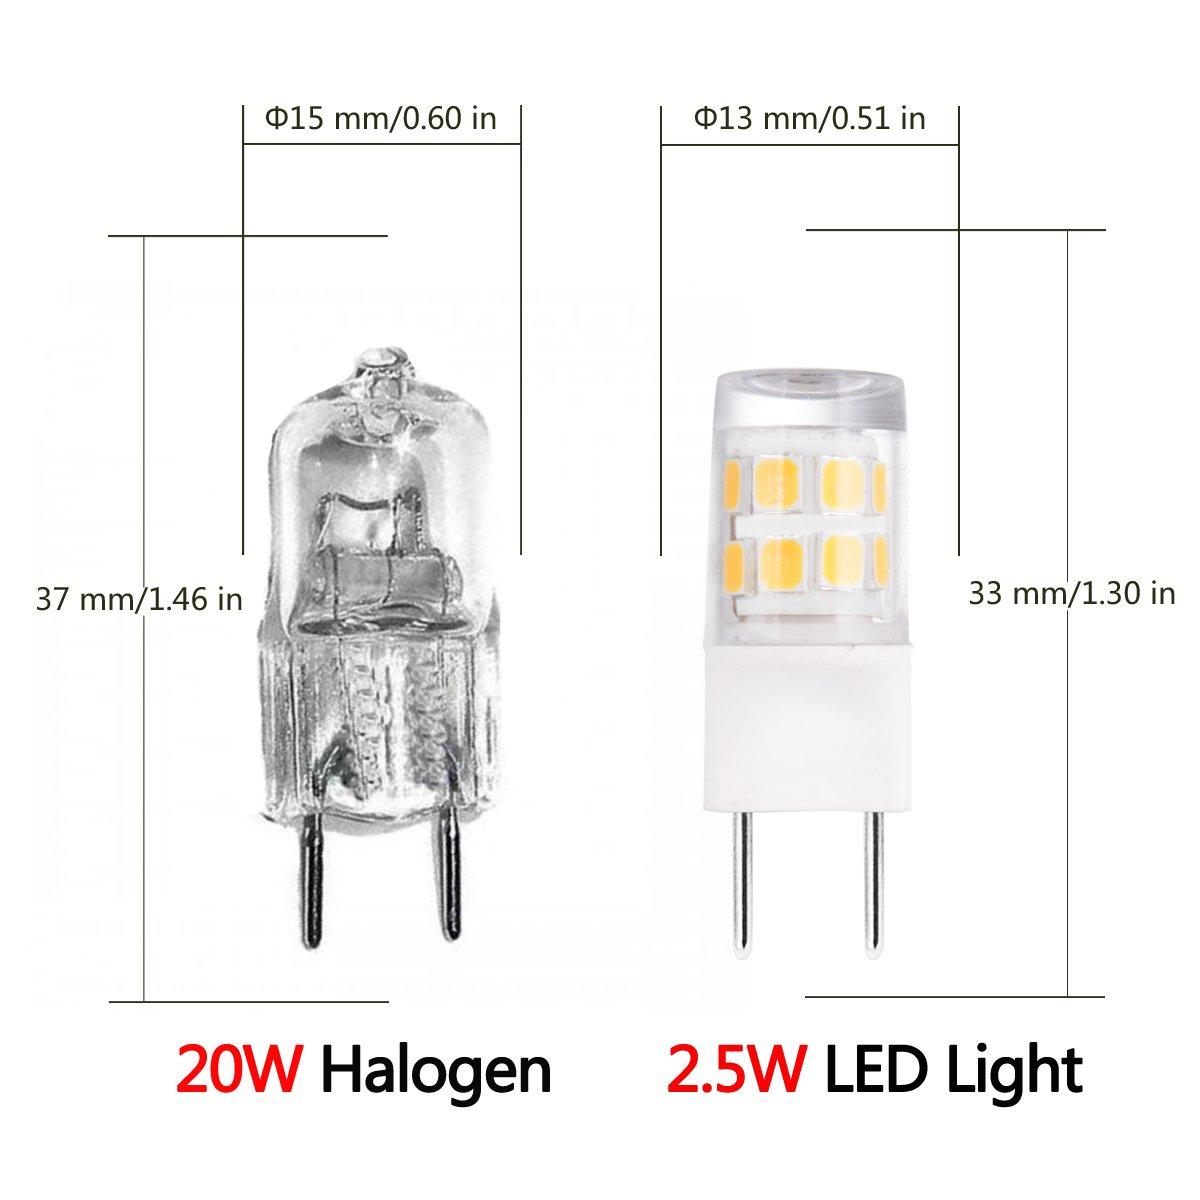 5 Pack Soft White 3000K JandCase G8 LED Light Bulbs 20W Halogen Equivalent 200LM 2.5W G8 Base Bulbs for Counter